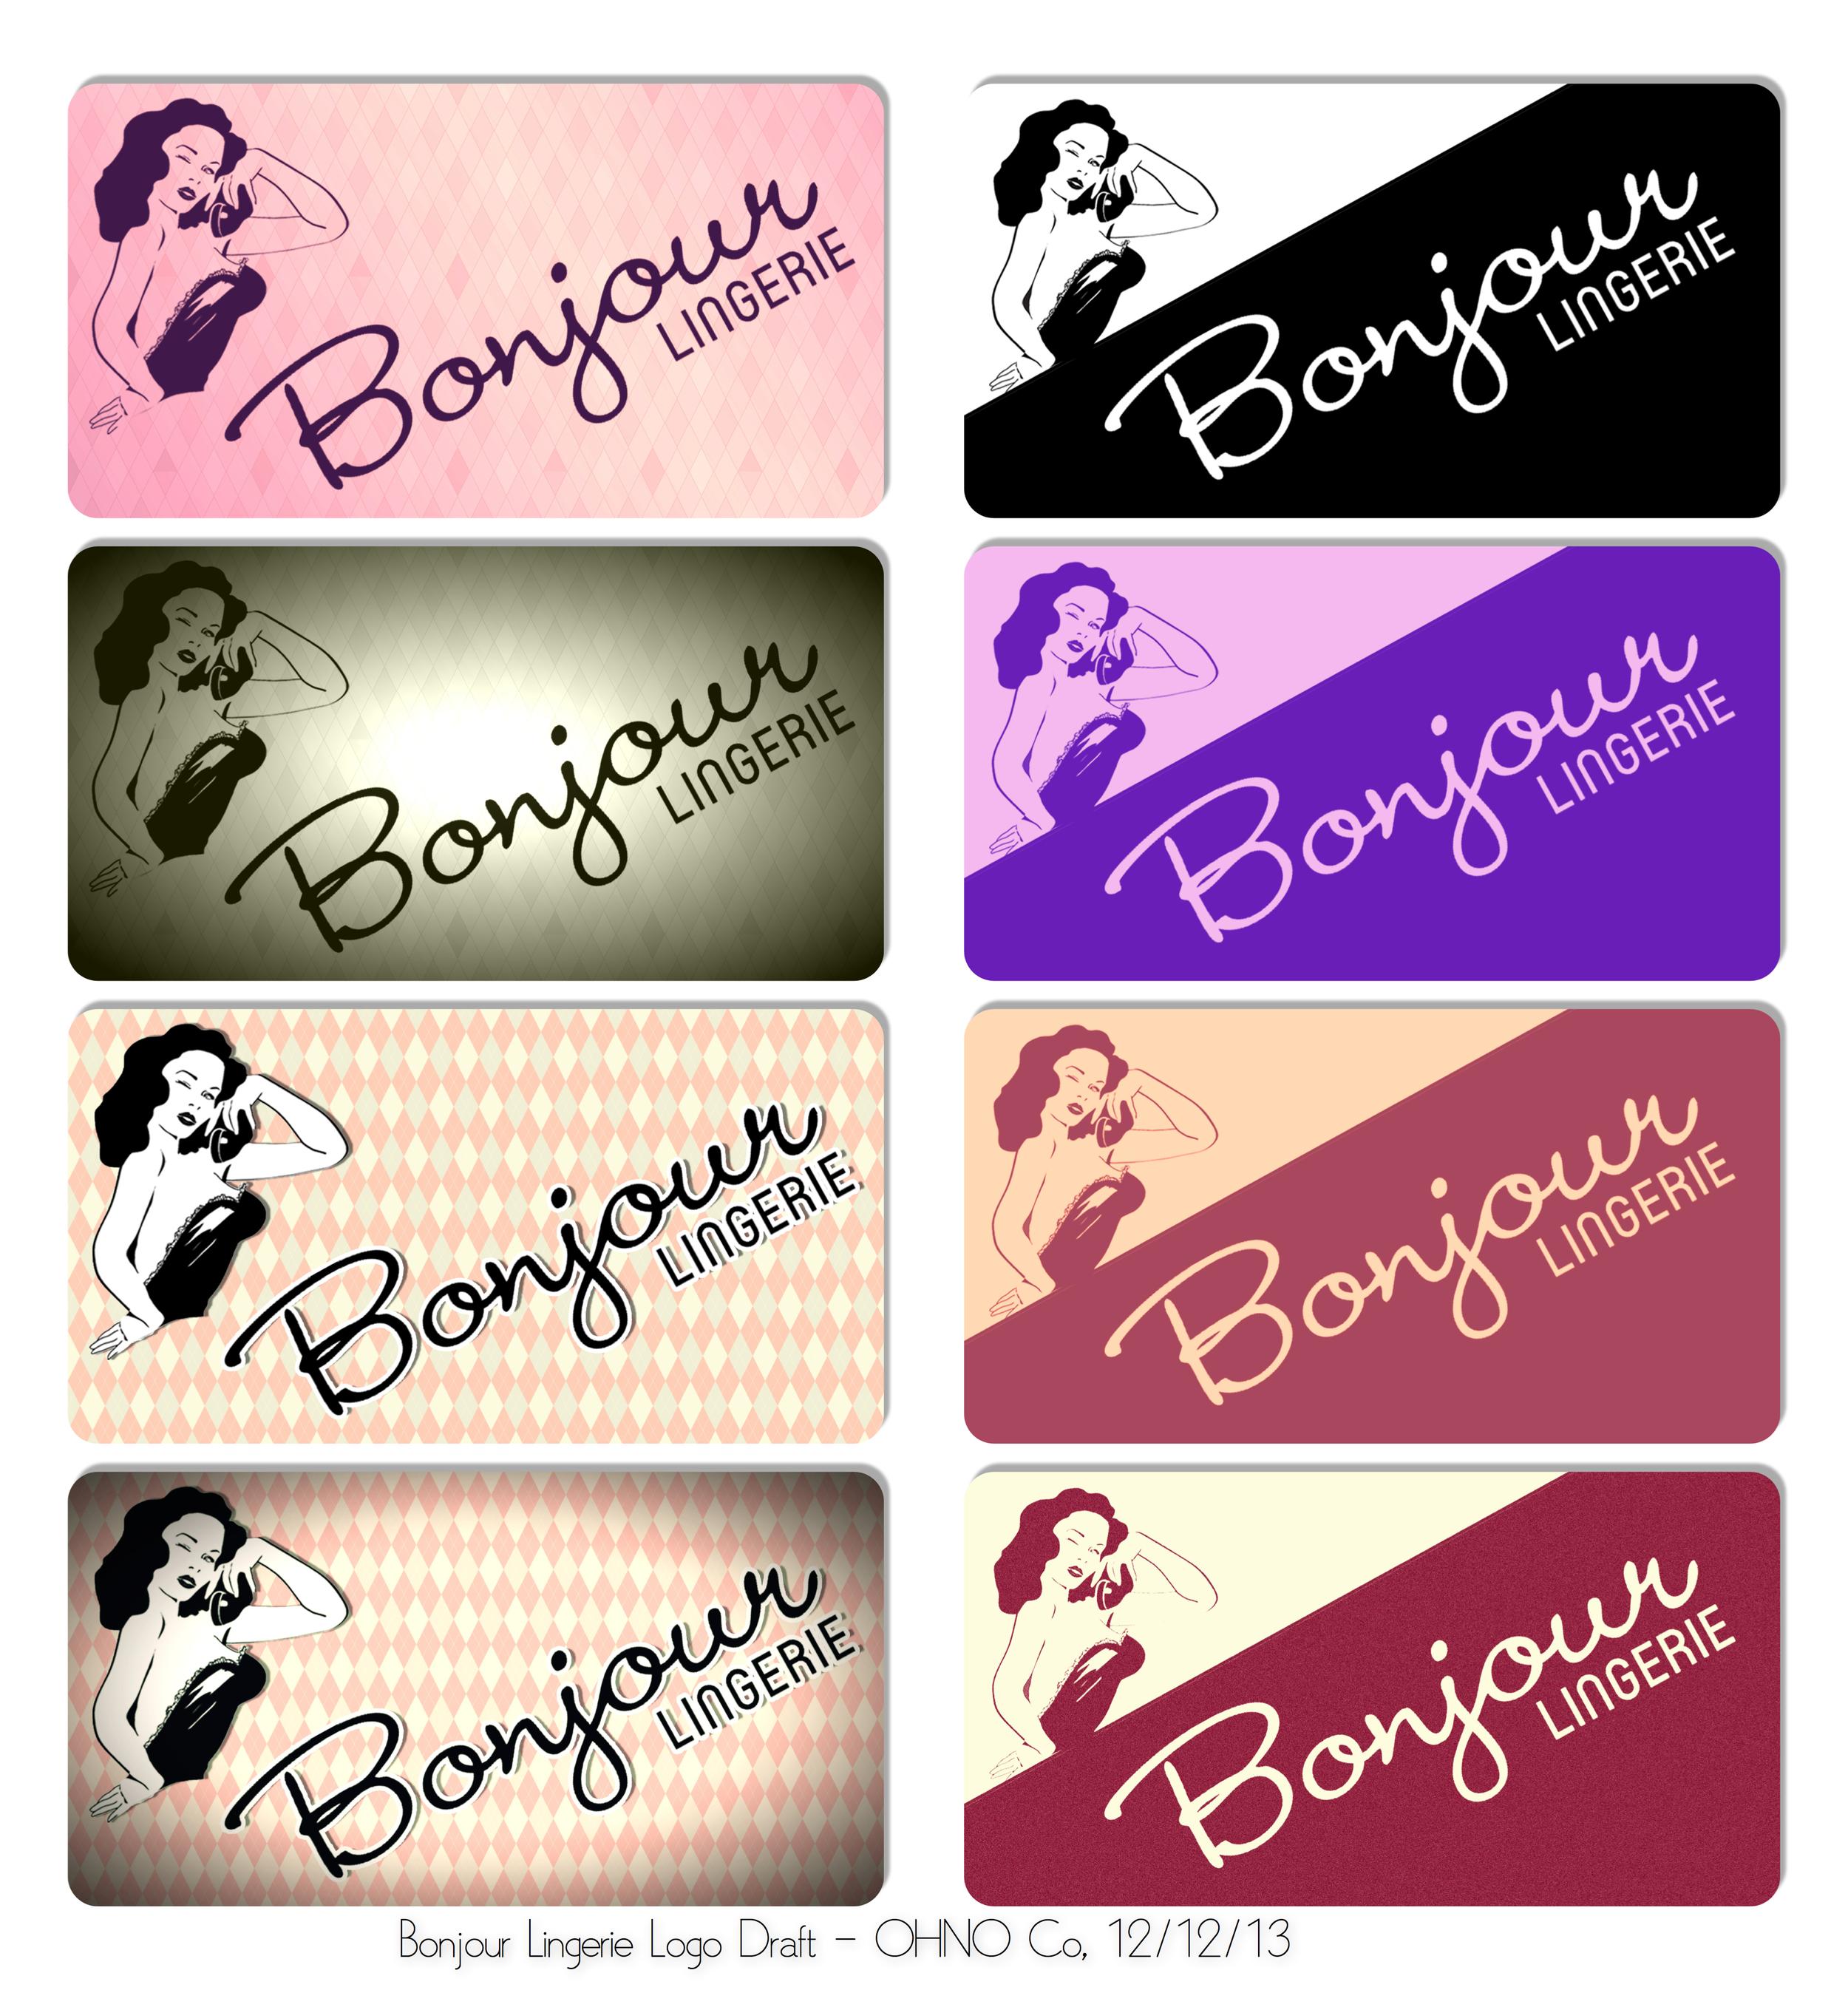 Various Branding Campaigns